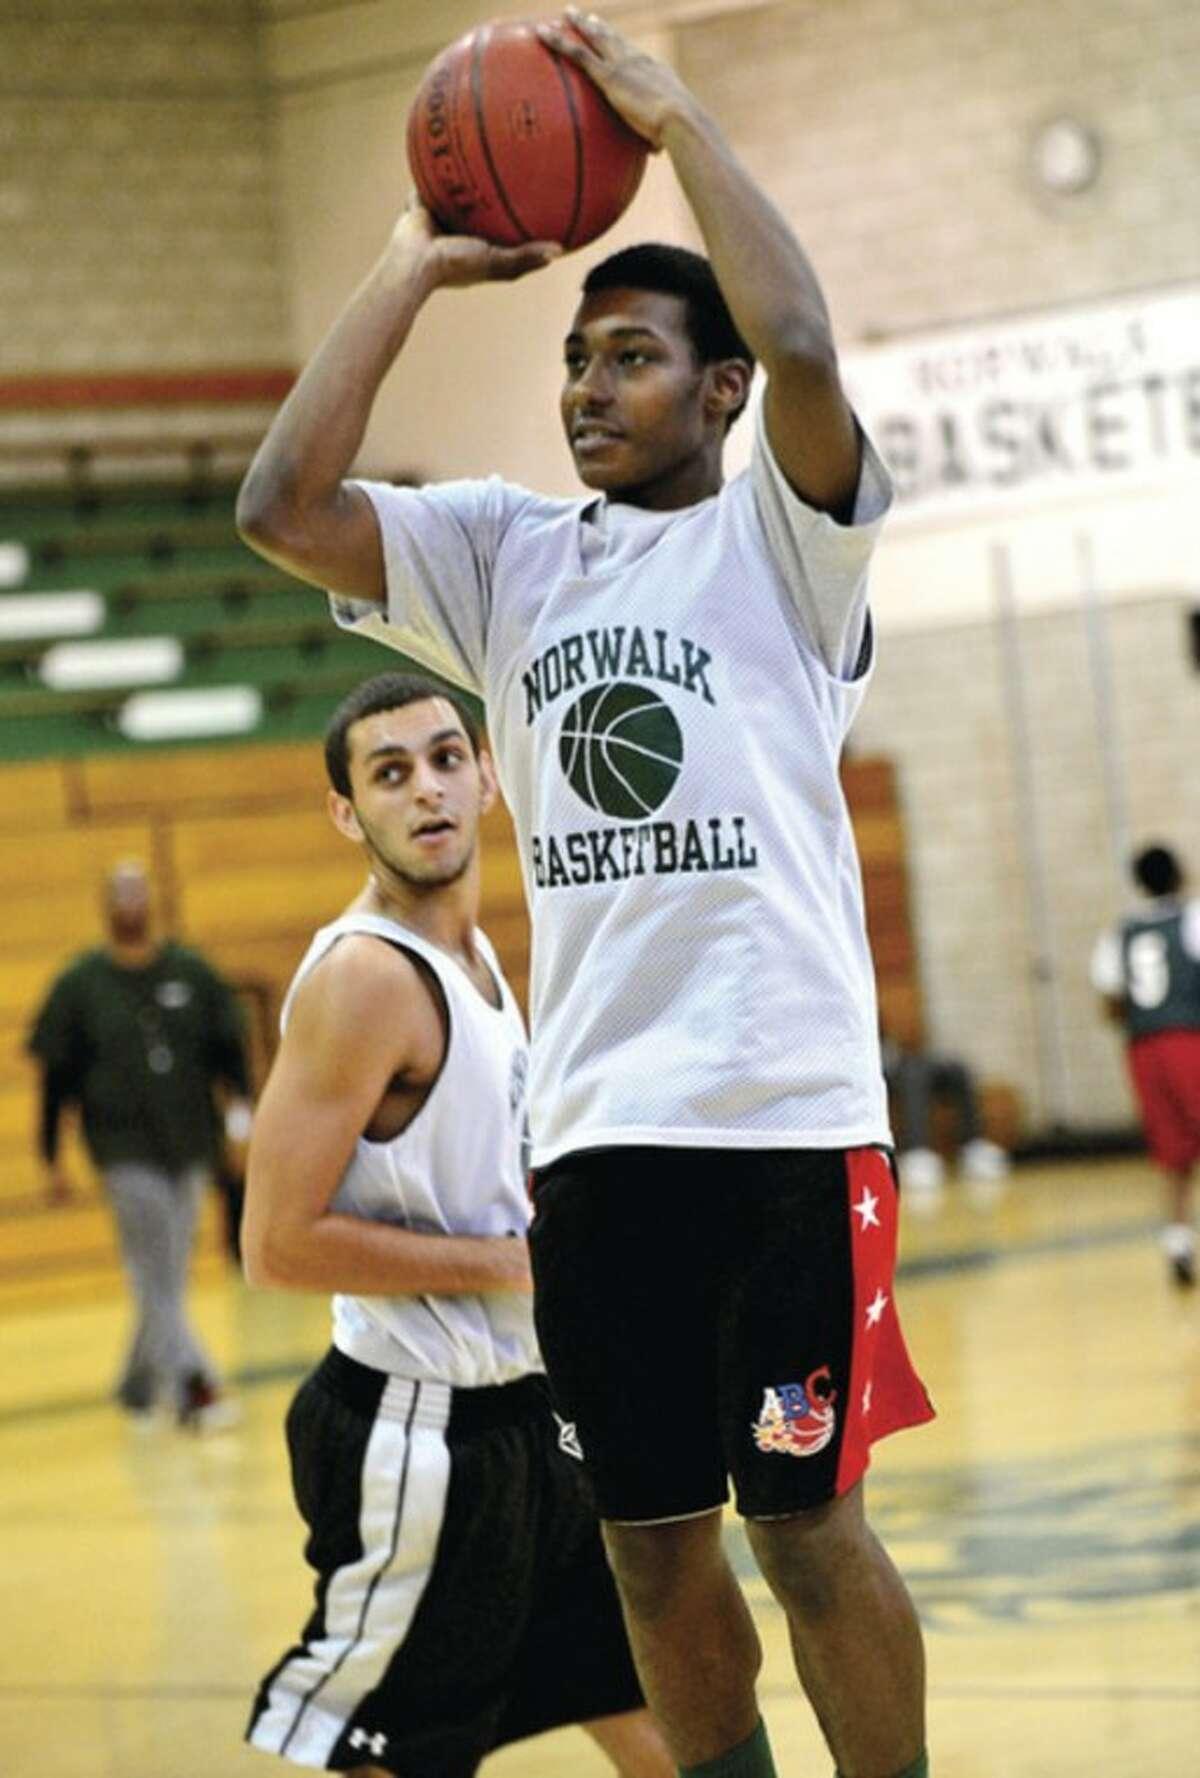 Norwalk High School hoops player Jabari Dear will help lead the team this year. Hour photo / Erik Trautmann